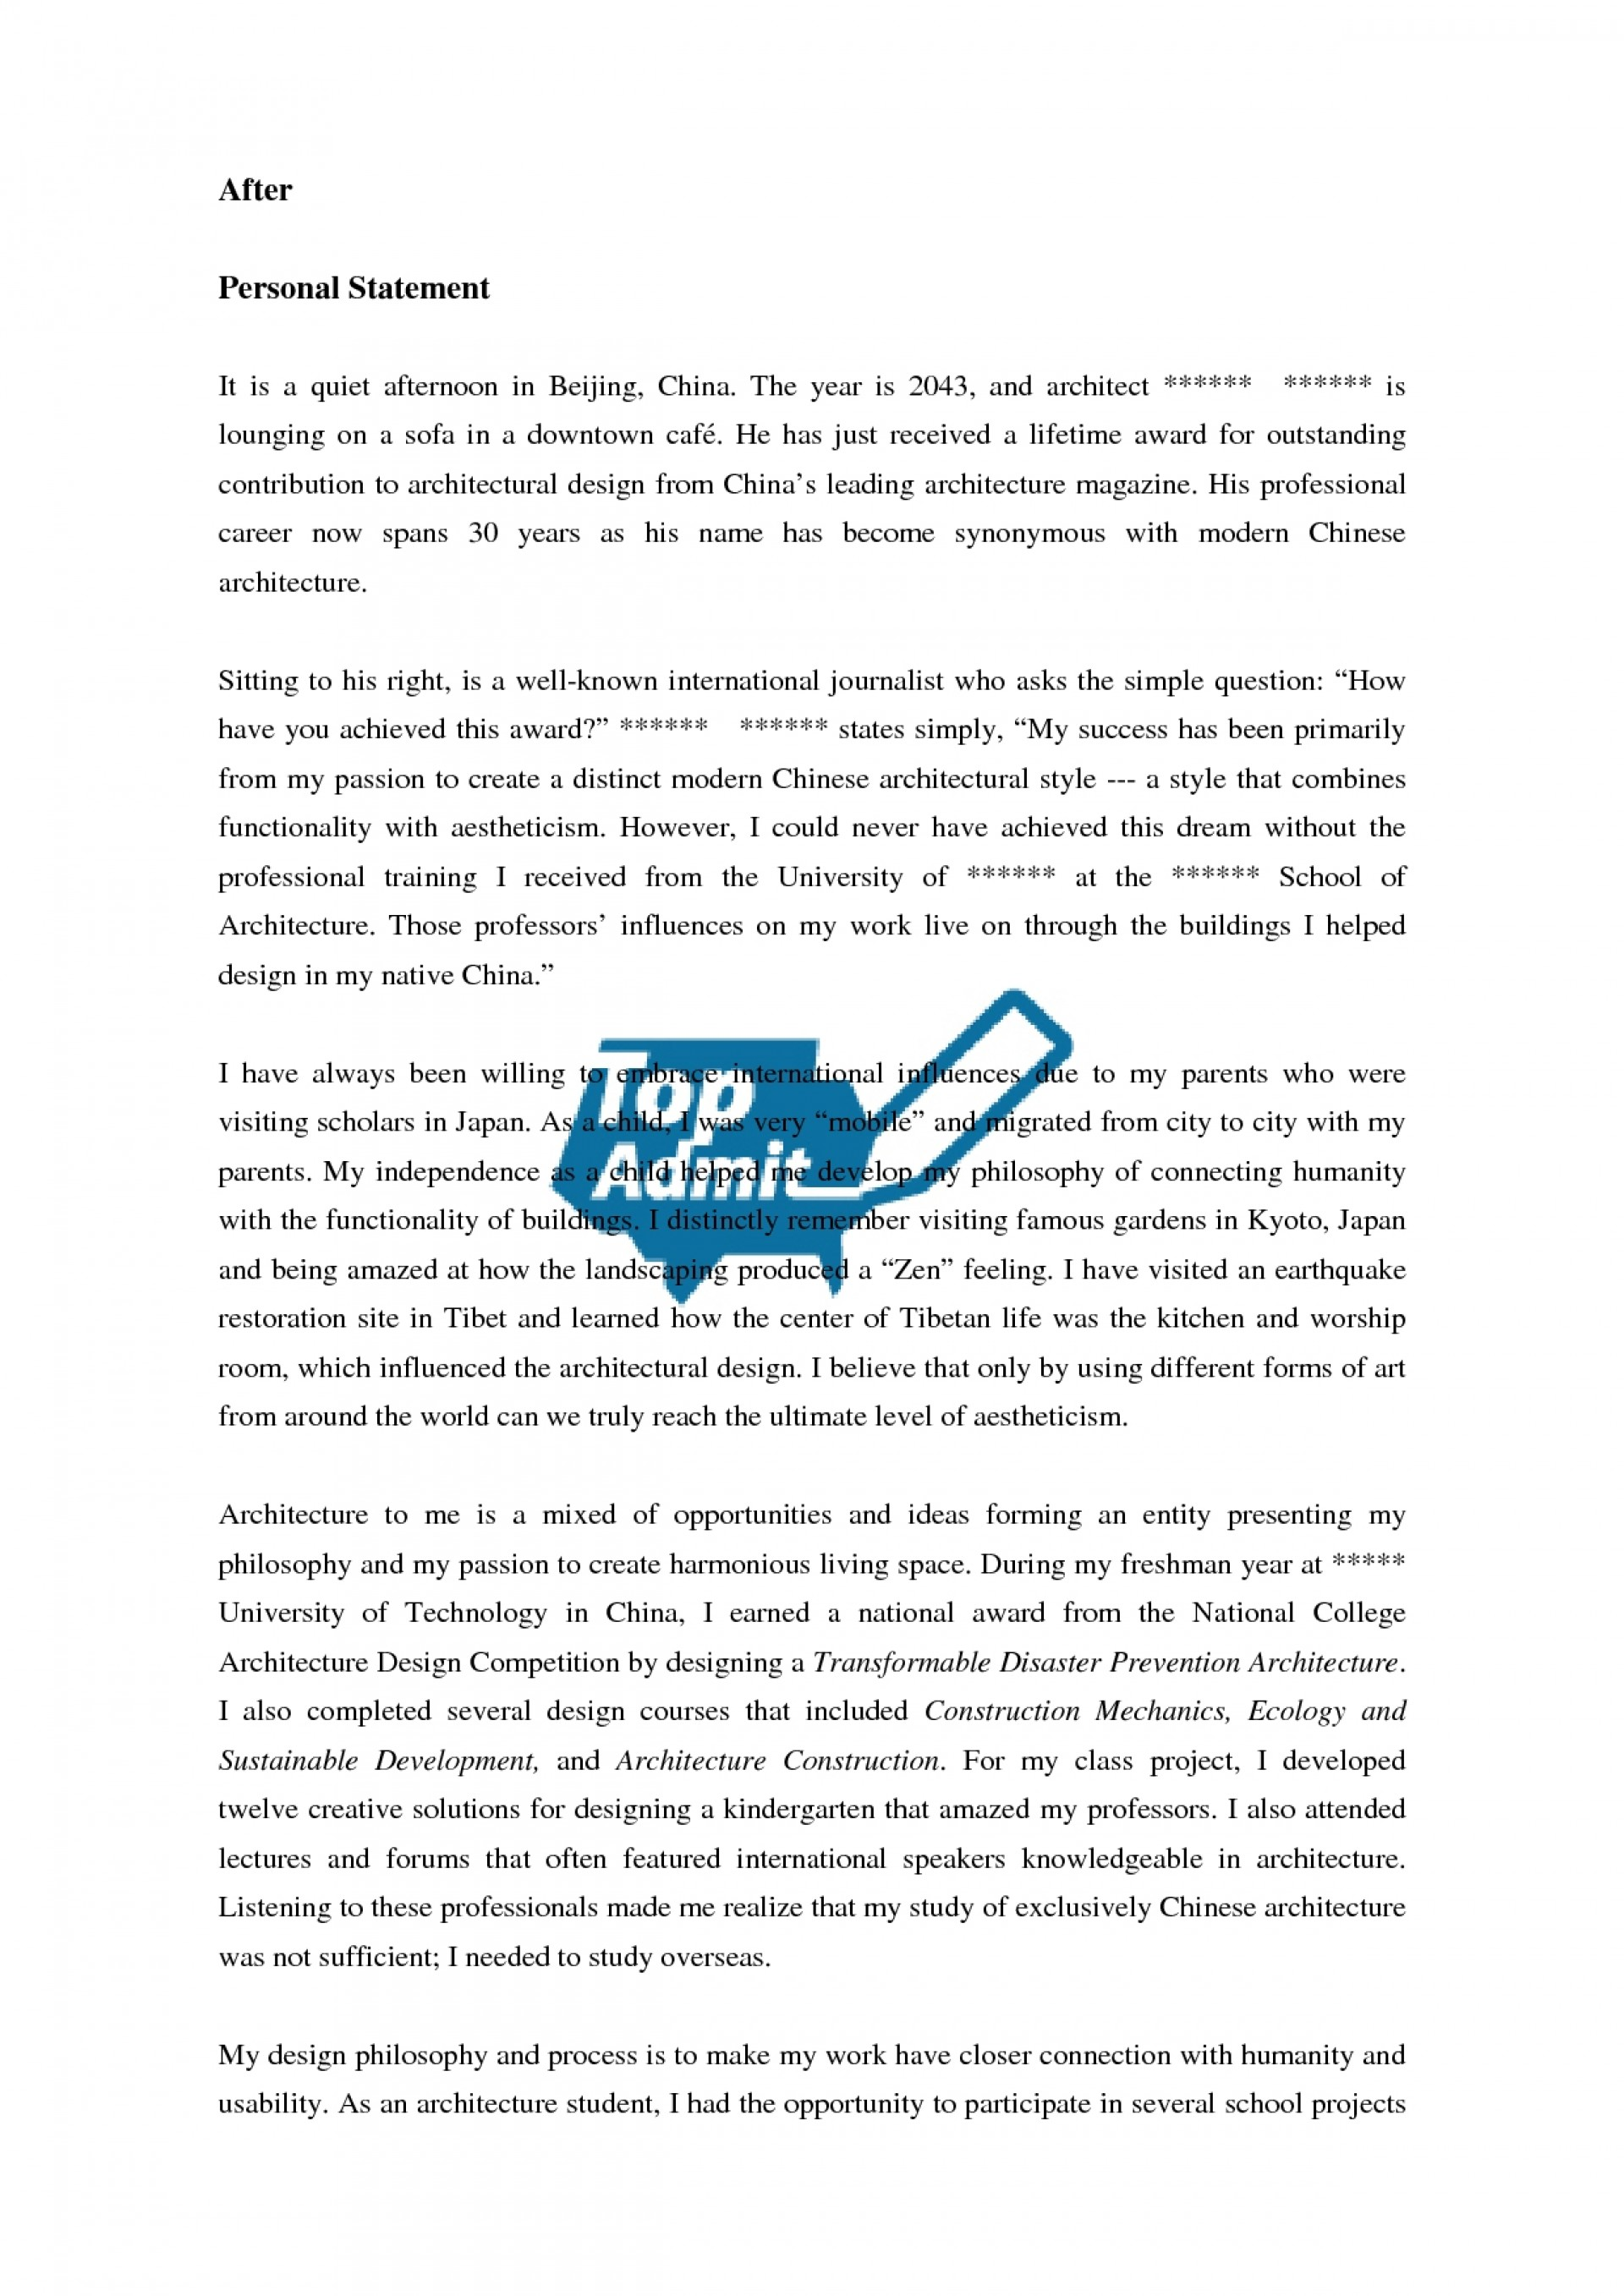 026 Zwjgmmd Common App Examples Best Example Essays Essay Samples Option 1 Prompt 2016 2017 1920